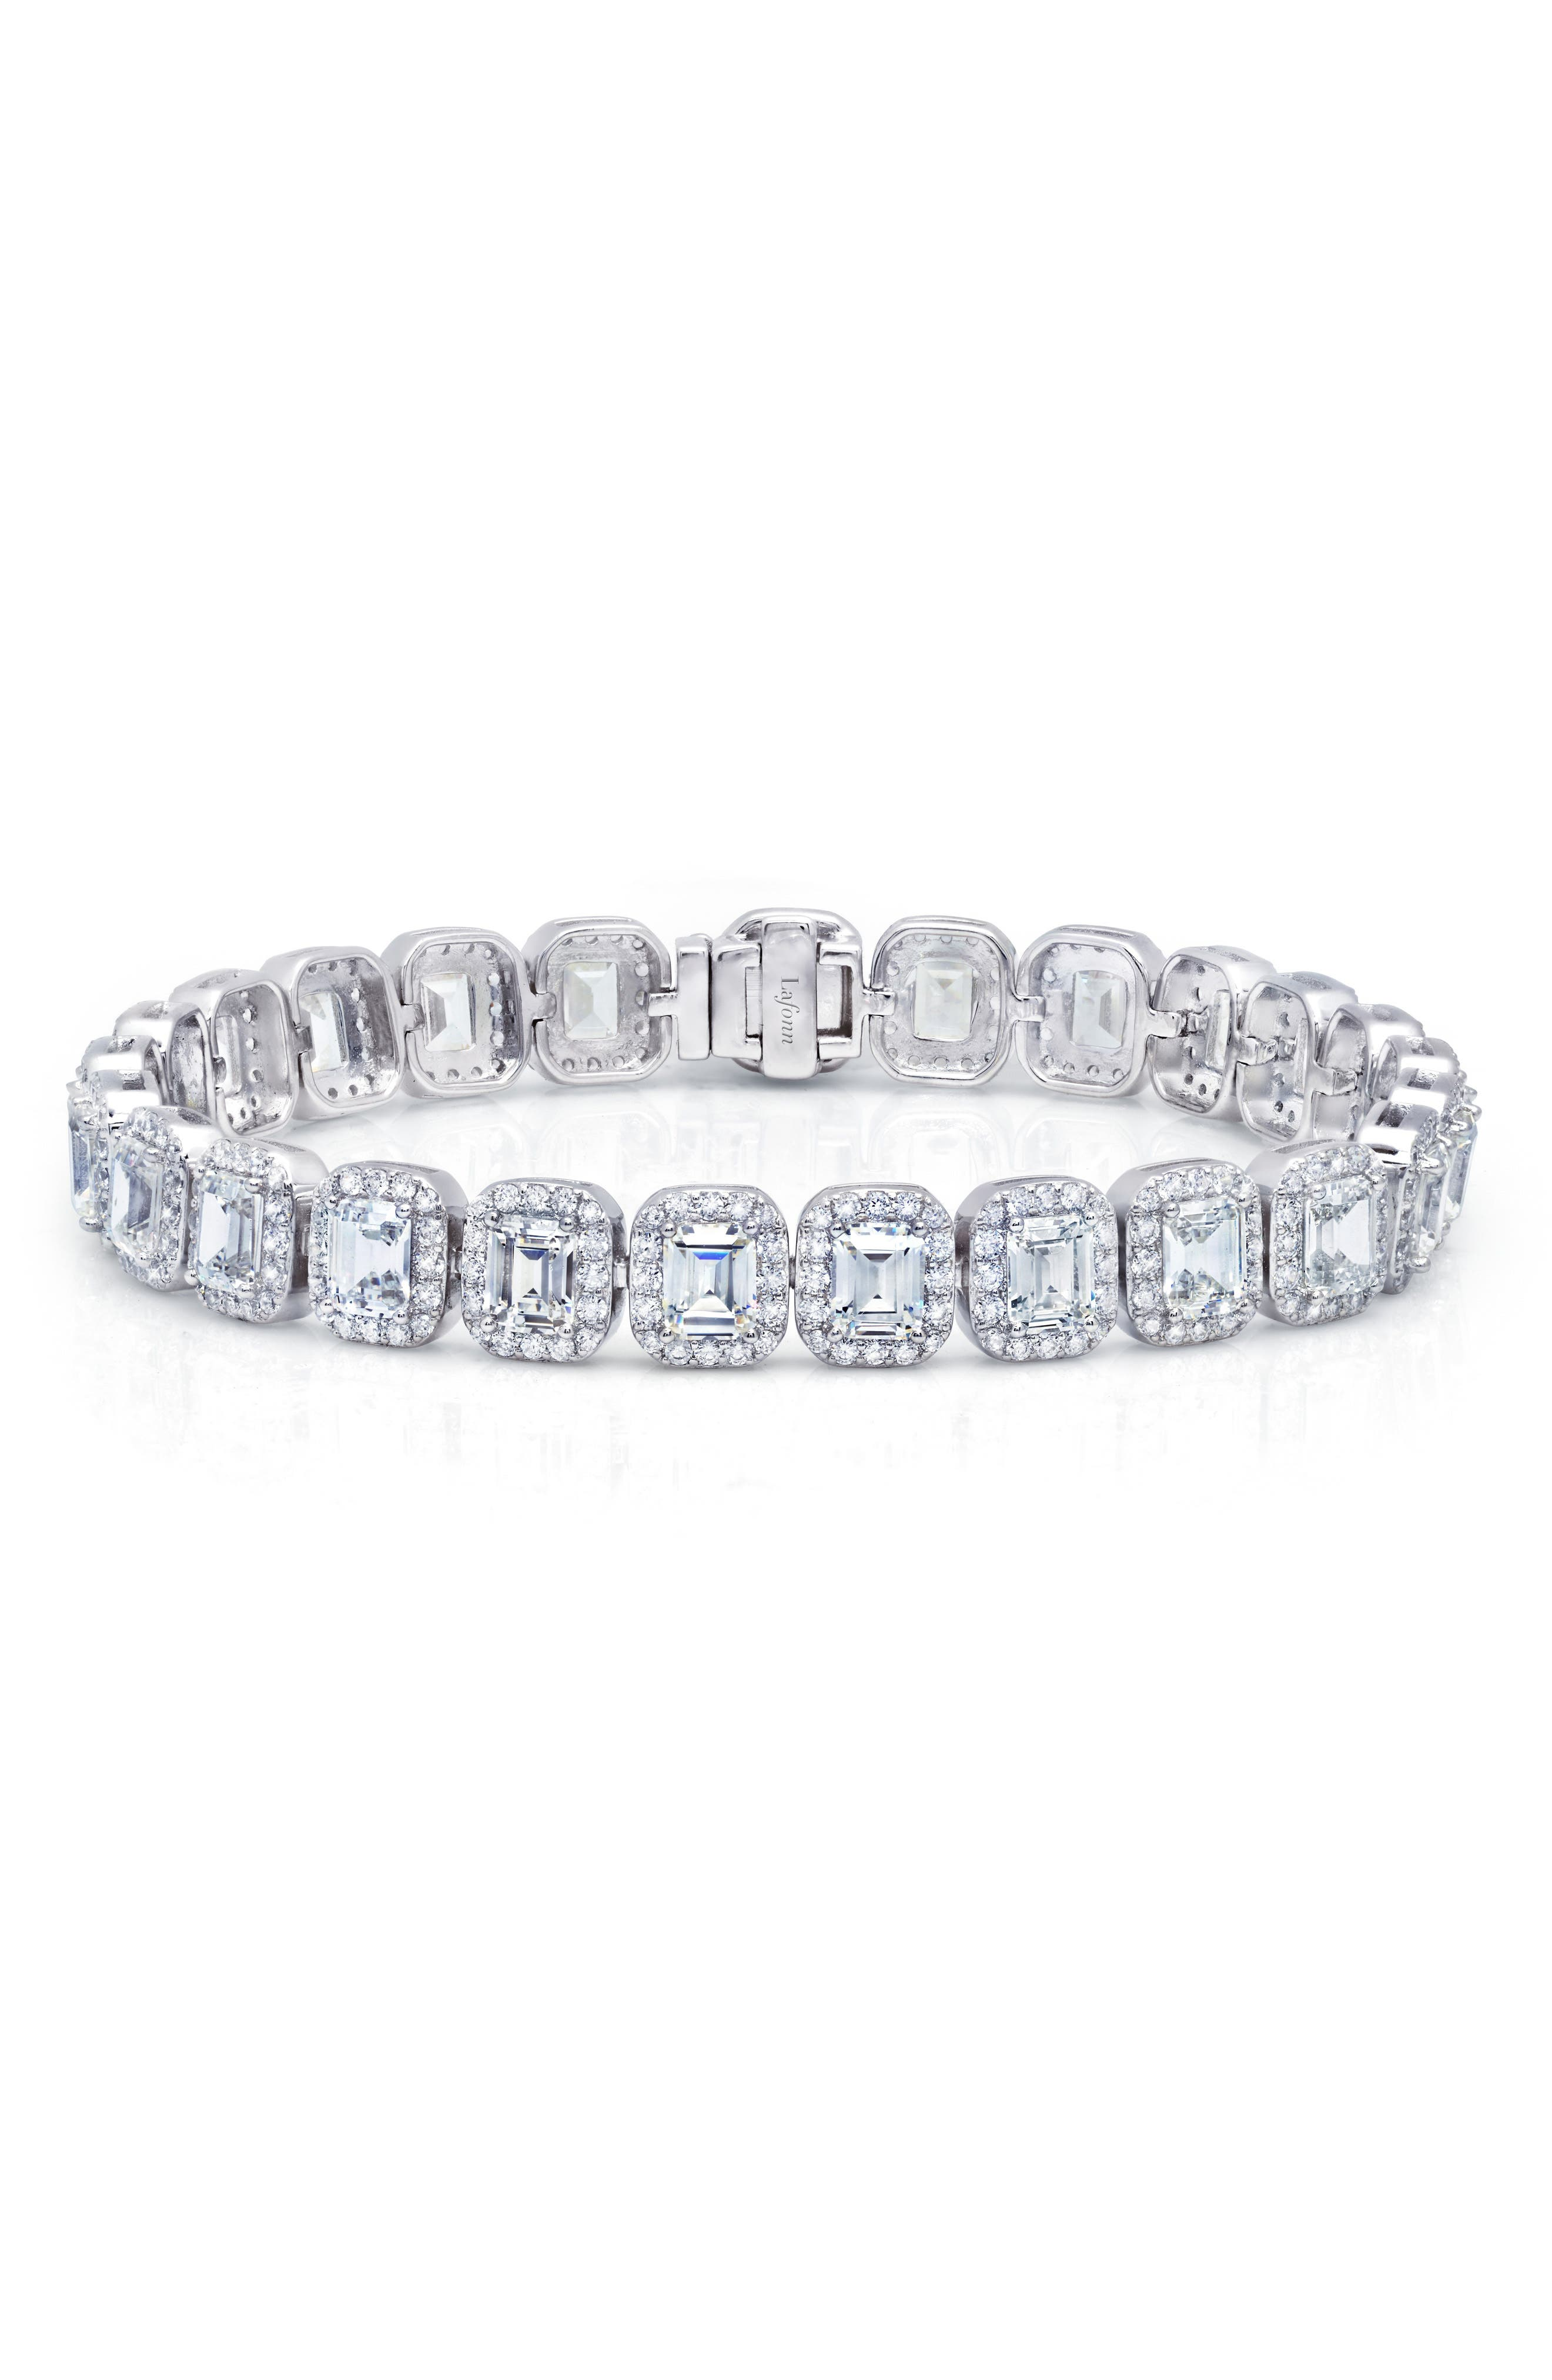 LAFONN Lassaire Emerald Cut Simulated Diamond Tennis Bracelet